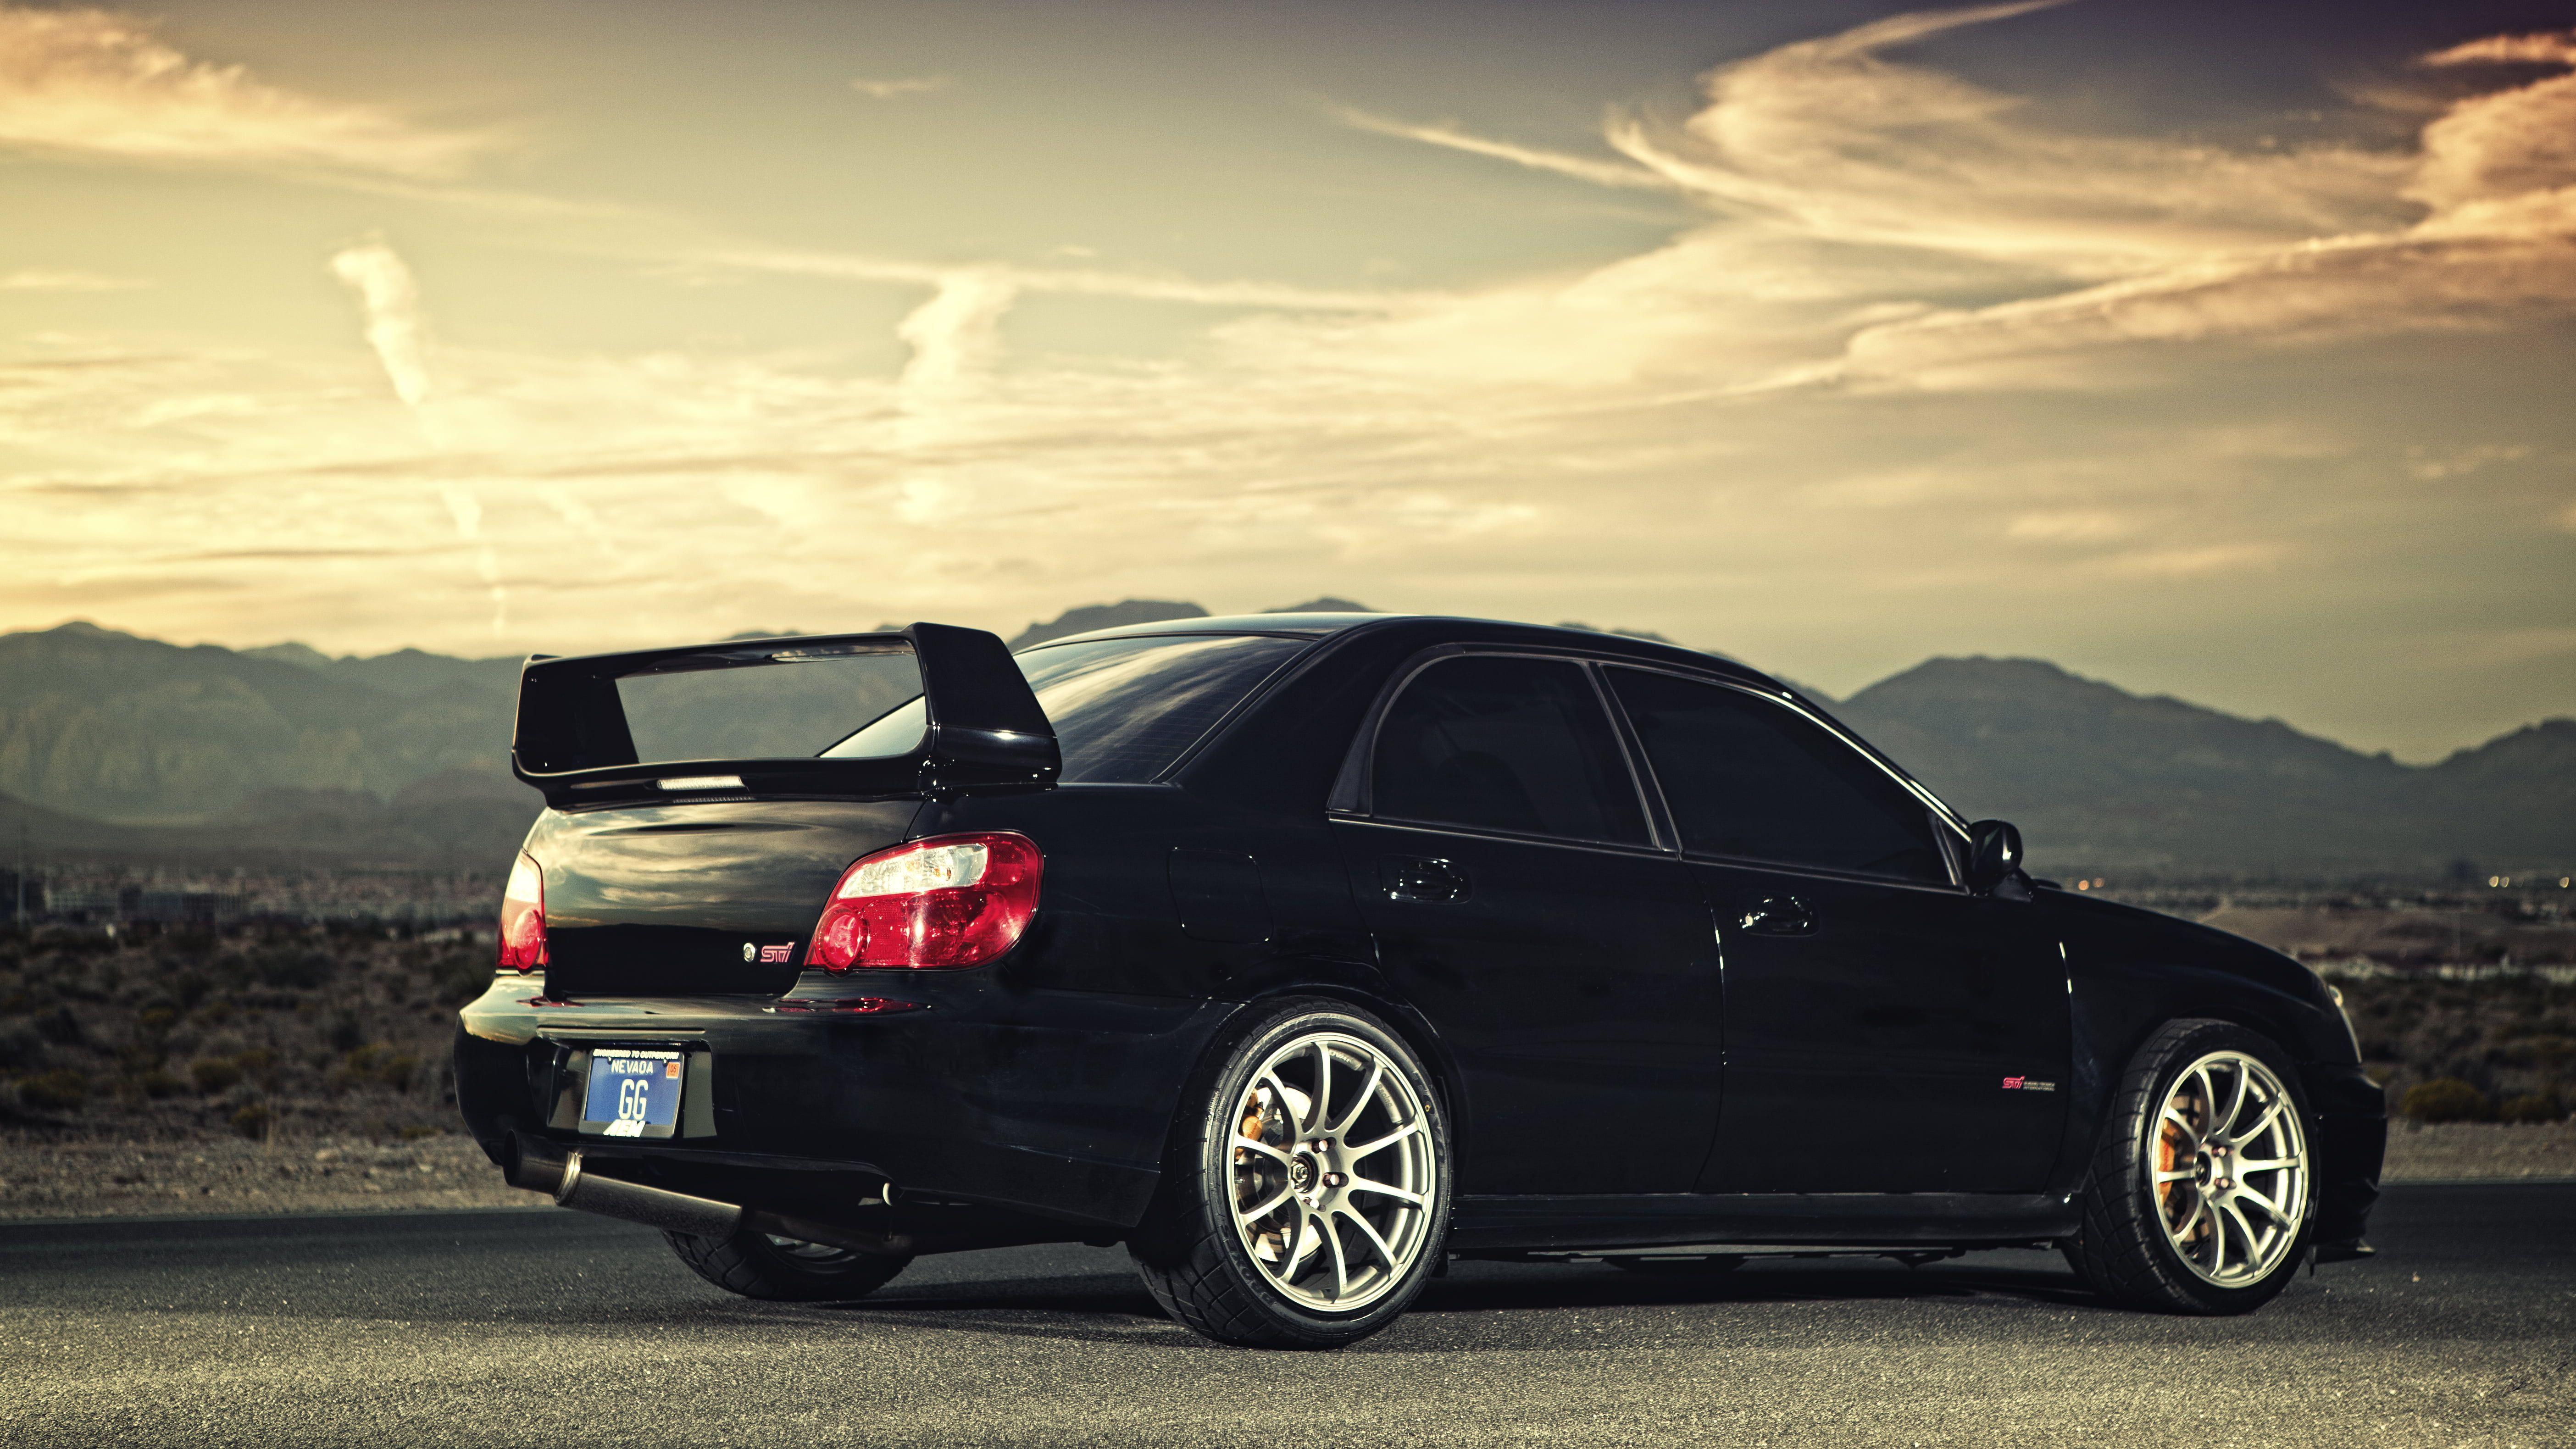 Subaru Impreza Wrx Sti Black Car Desert Dirt Spec D Blobeye 5k Wallpaper Hdwallpaper Desktop Impreza Wrx Subaru Hd wallpaper subaru black car road